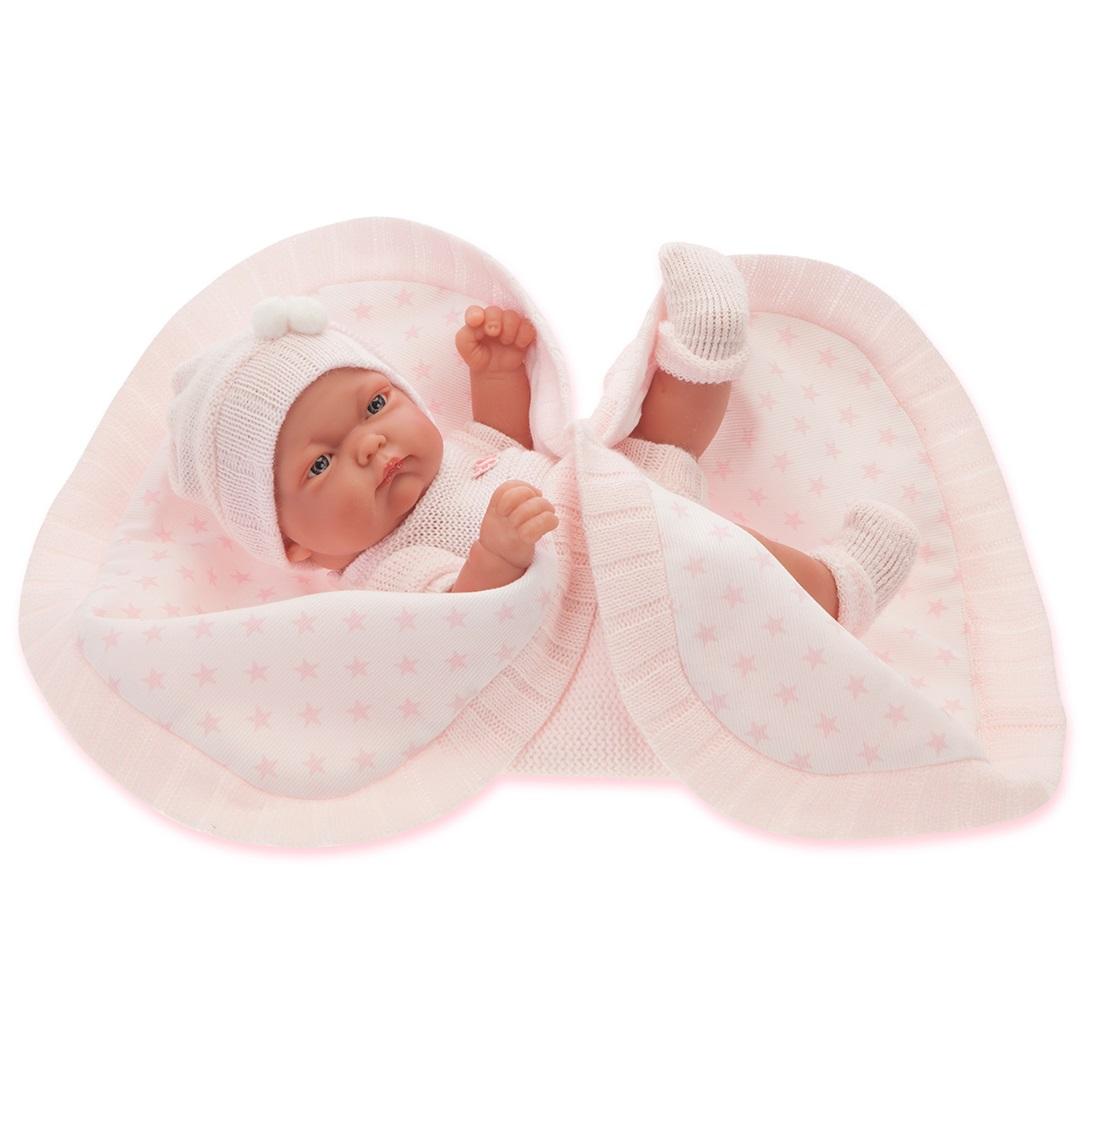 Кукла-младенец Карла в розовом, 26 см.Куклы Антонио Хуан (Antonio Juan Munecas)<br>Кукла-младенец Карла в розовом, 26 см.<br>